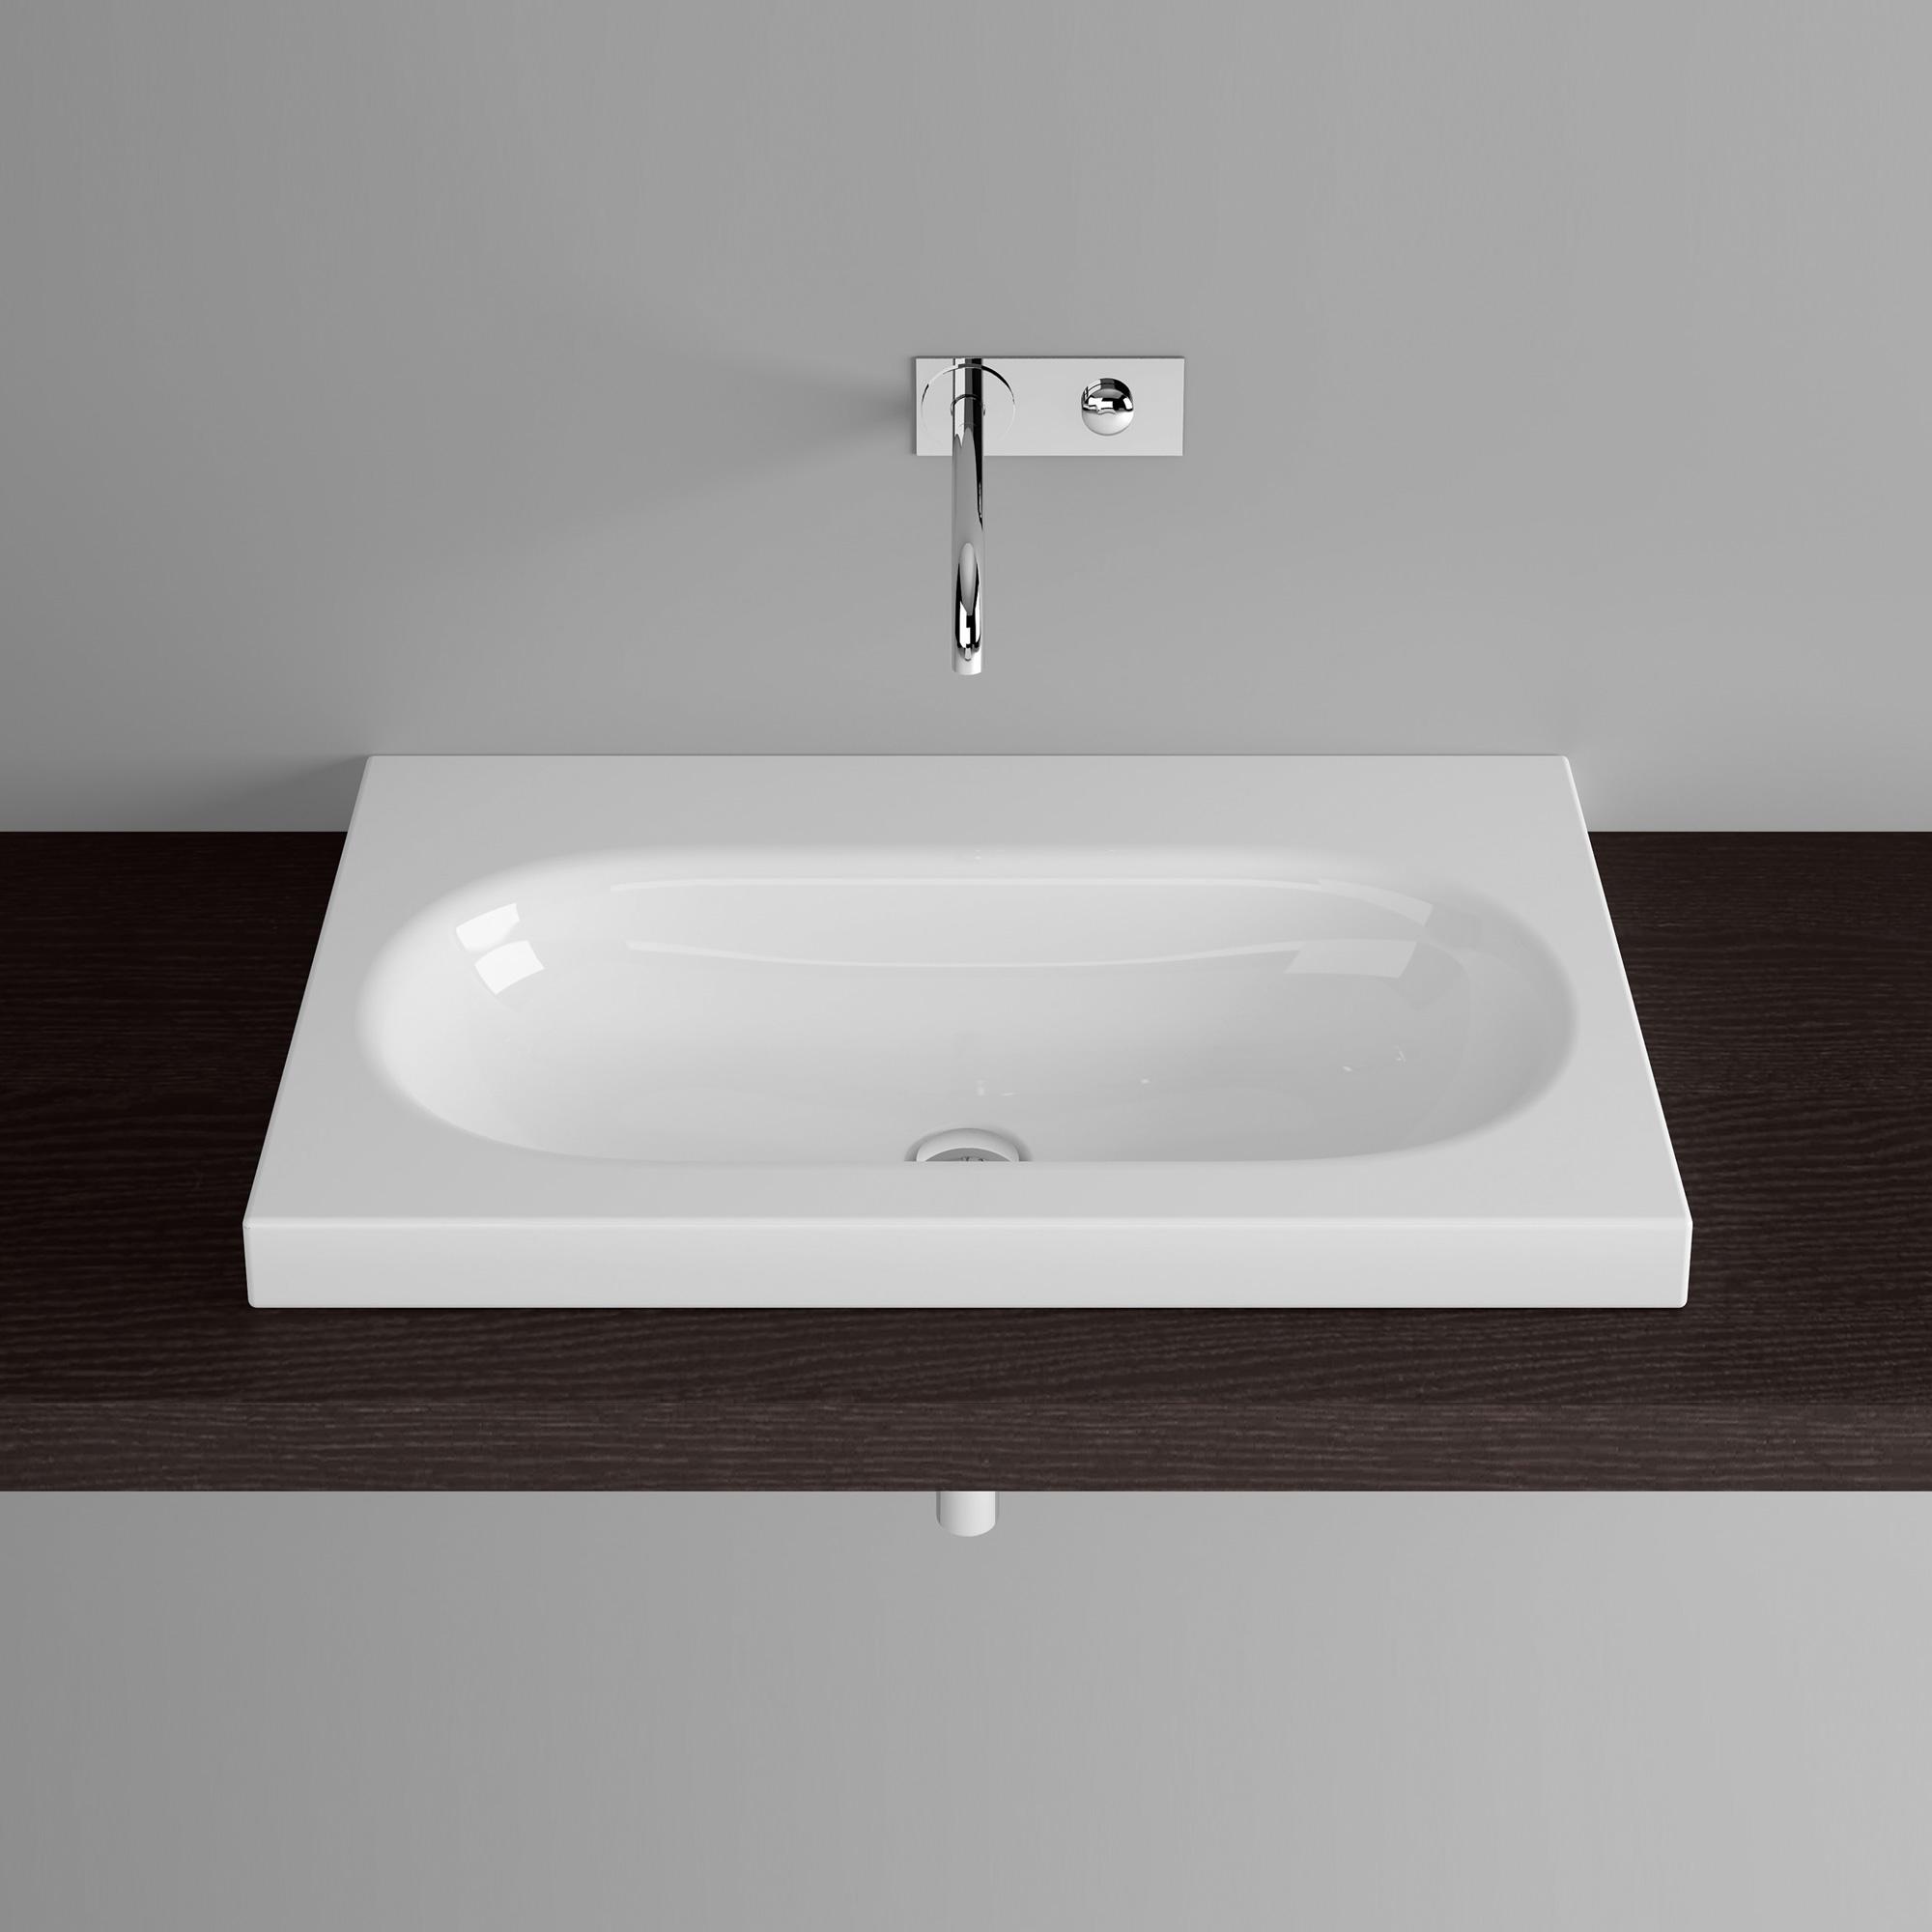 bette comodo aufsatz waschtisch wei betteglasur a206 000pw reuter onlineshop. Black Bedroom Furniture Sets. Home Design Ideas